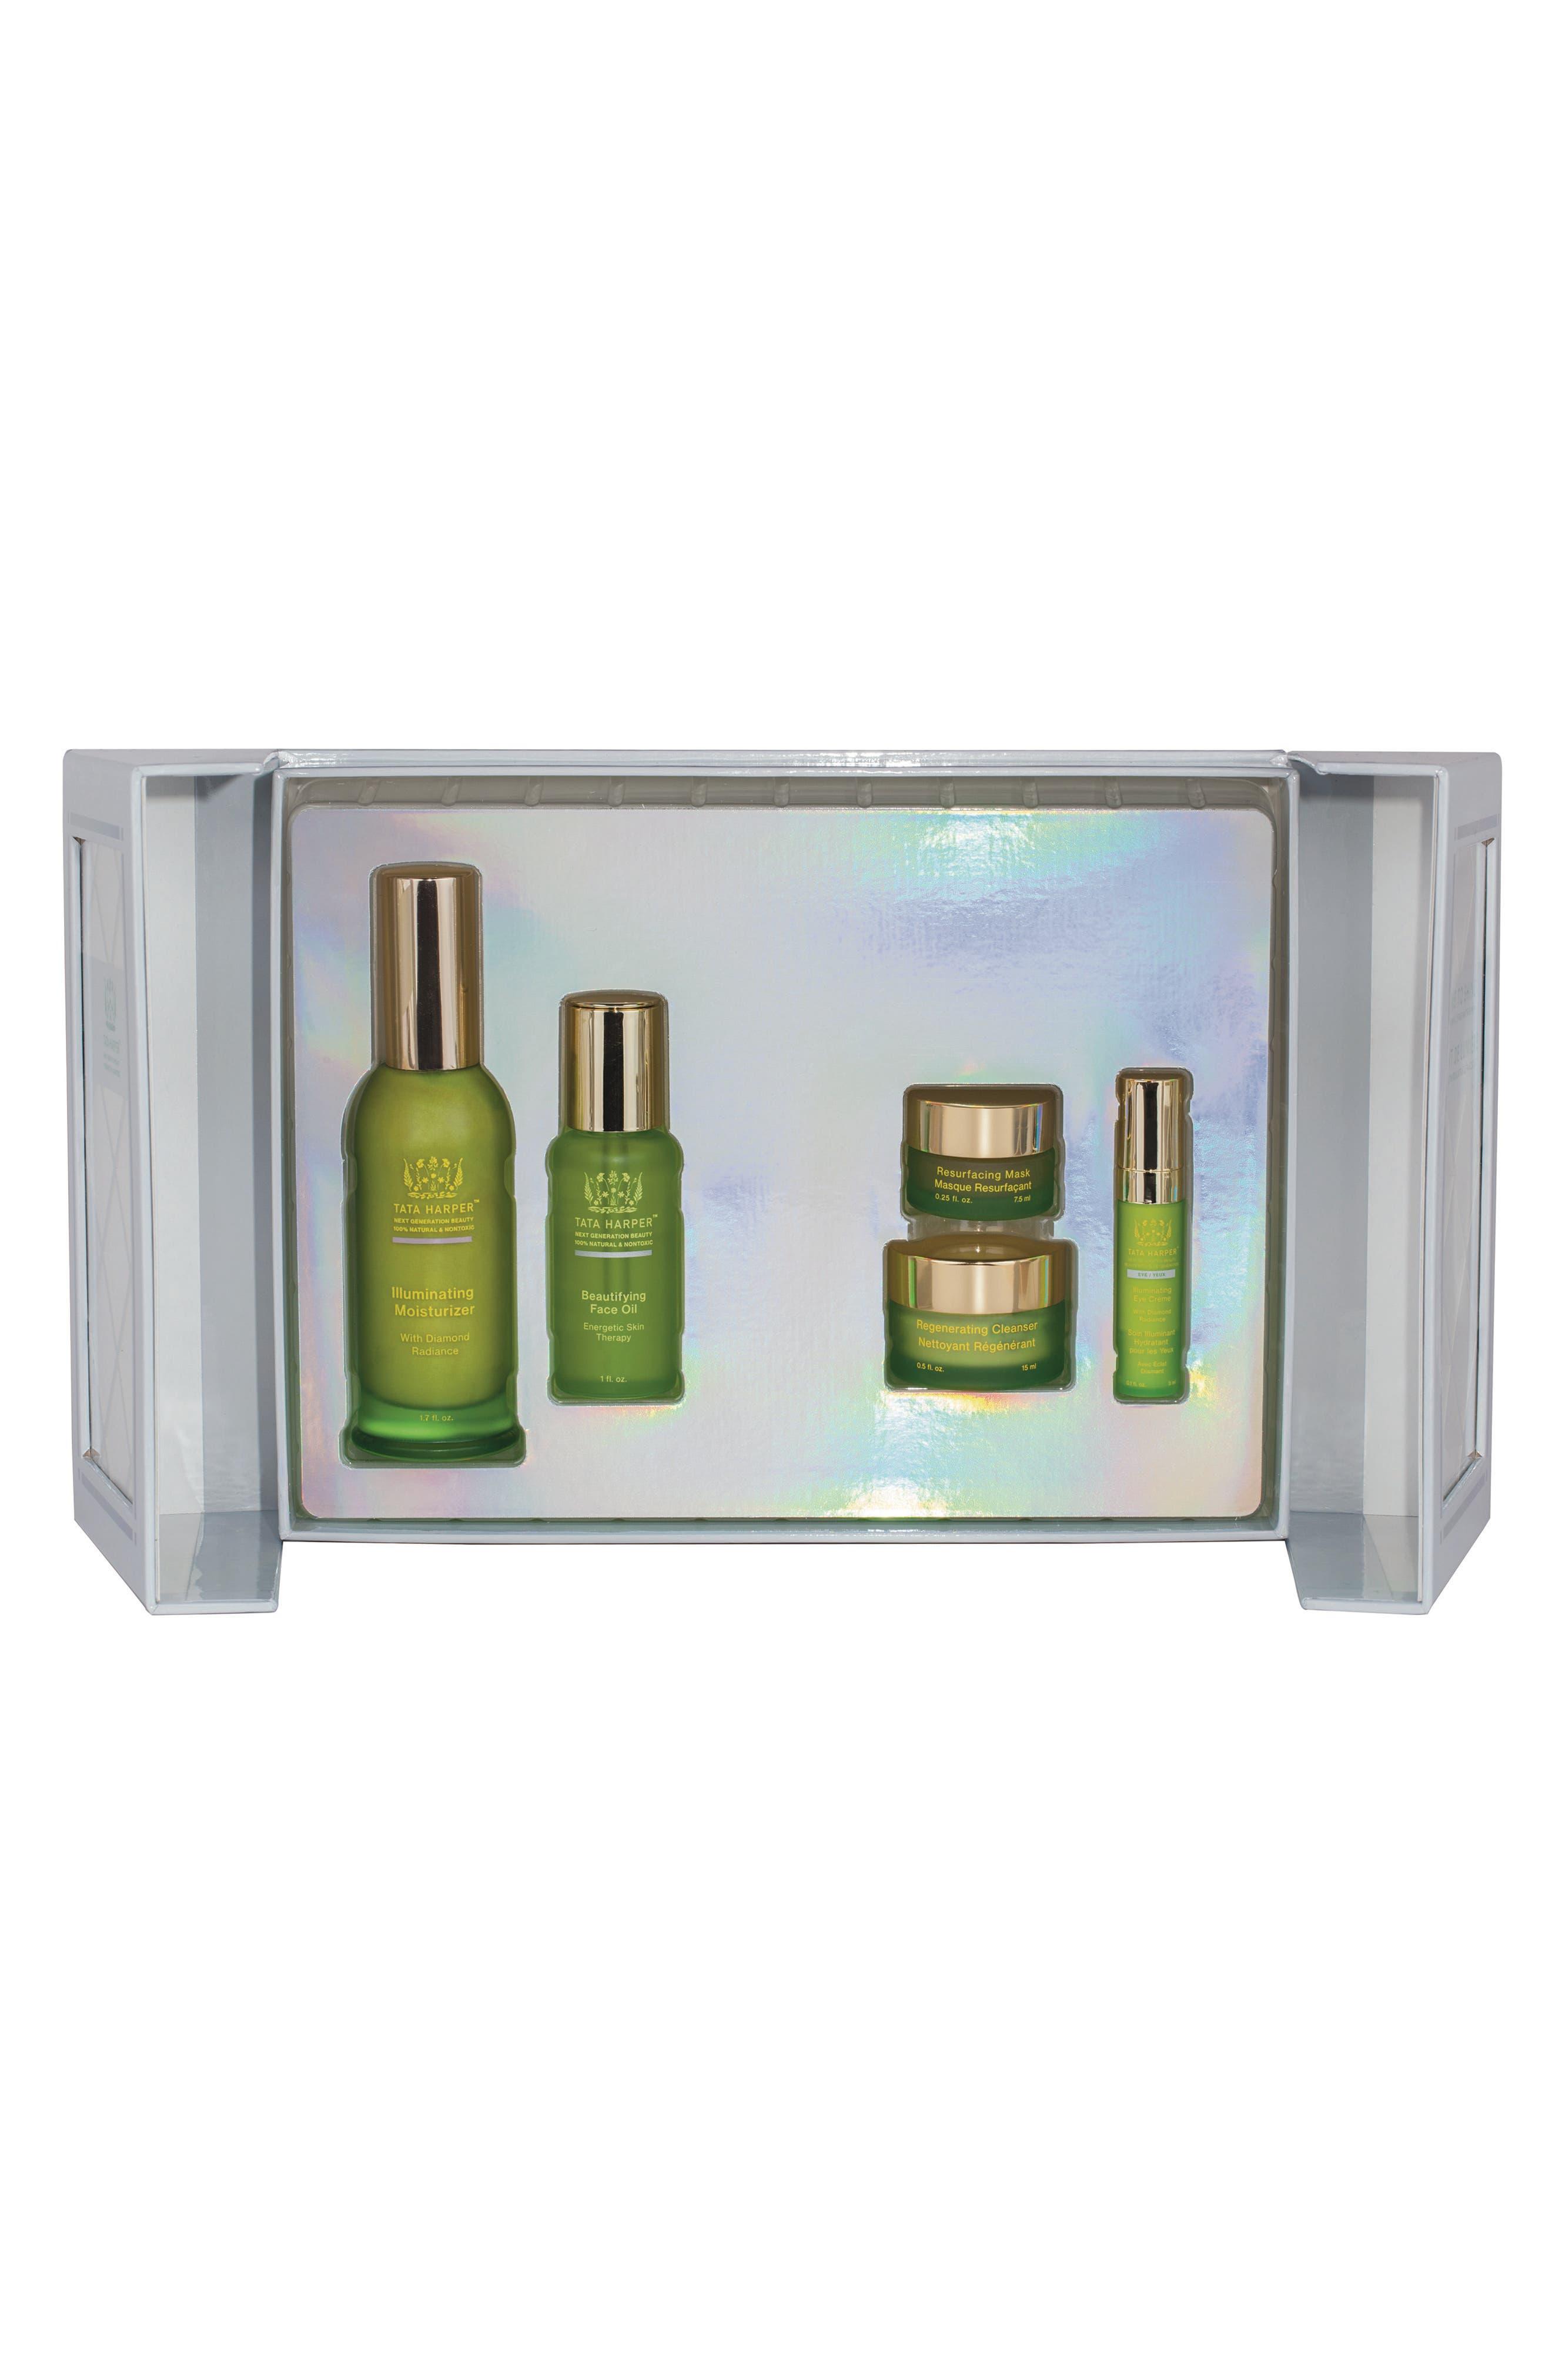 Main Image - Tata Harper Skincare Time To Shine Set ($217 Value)